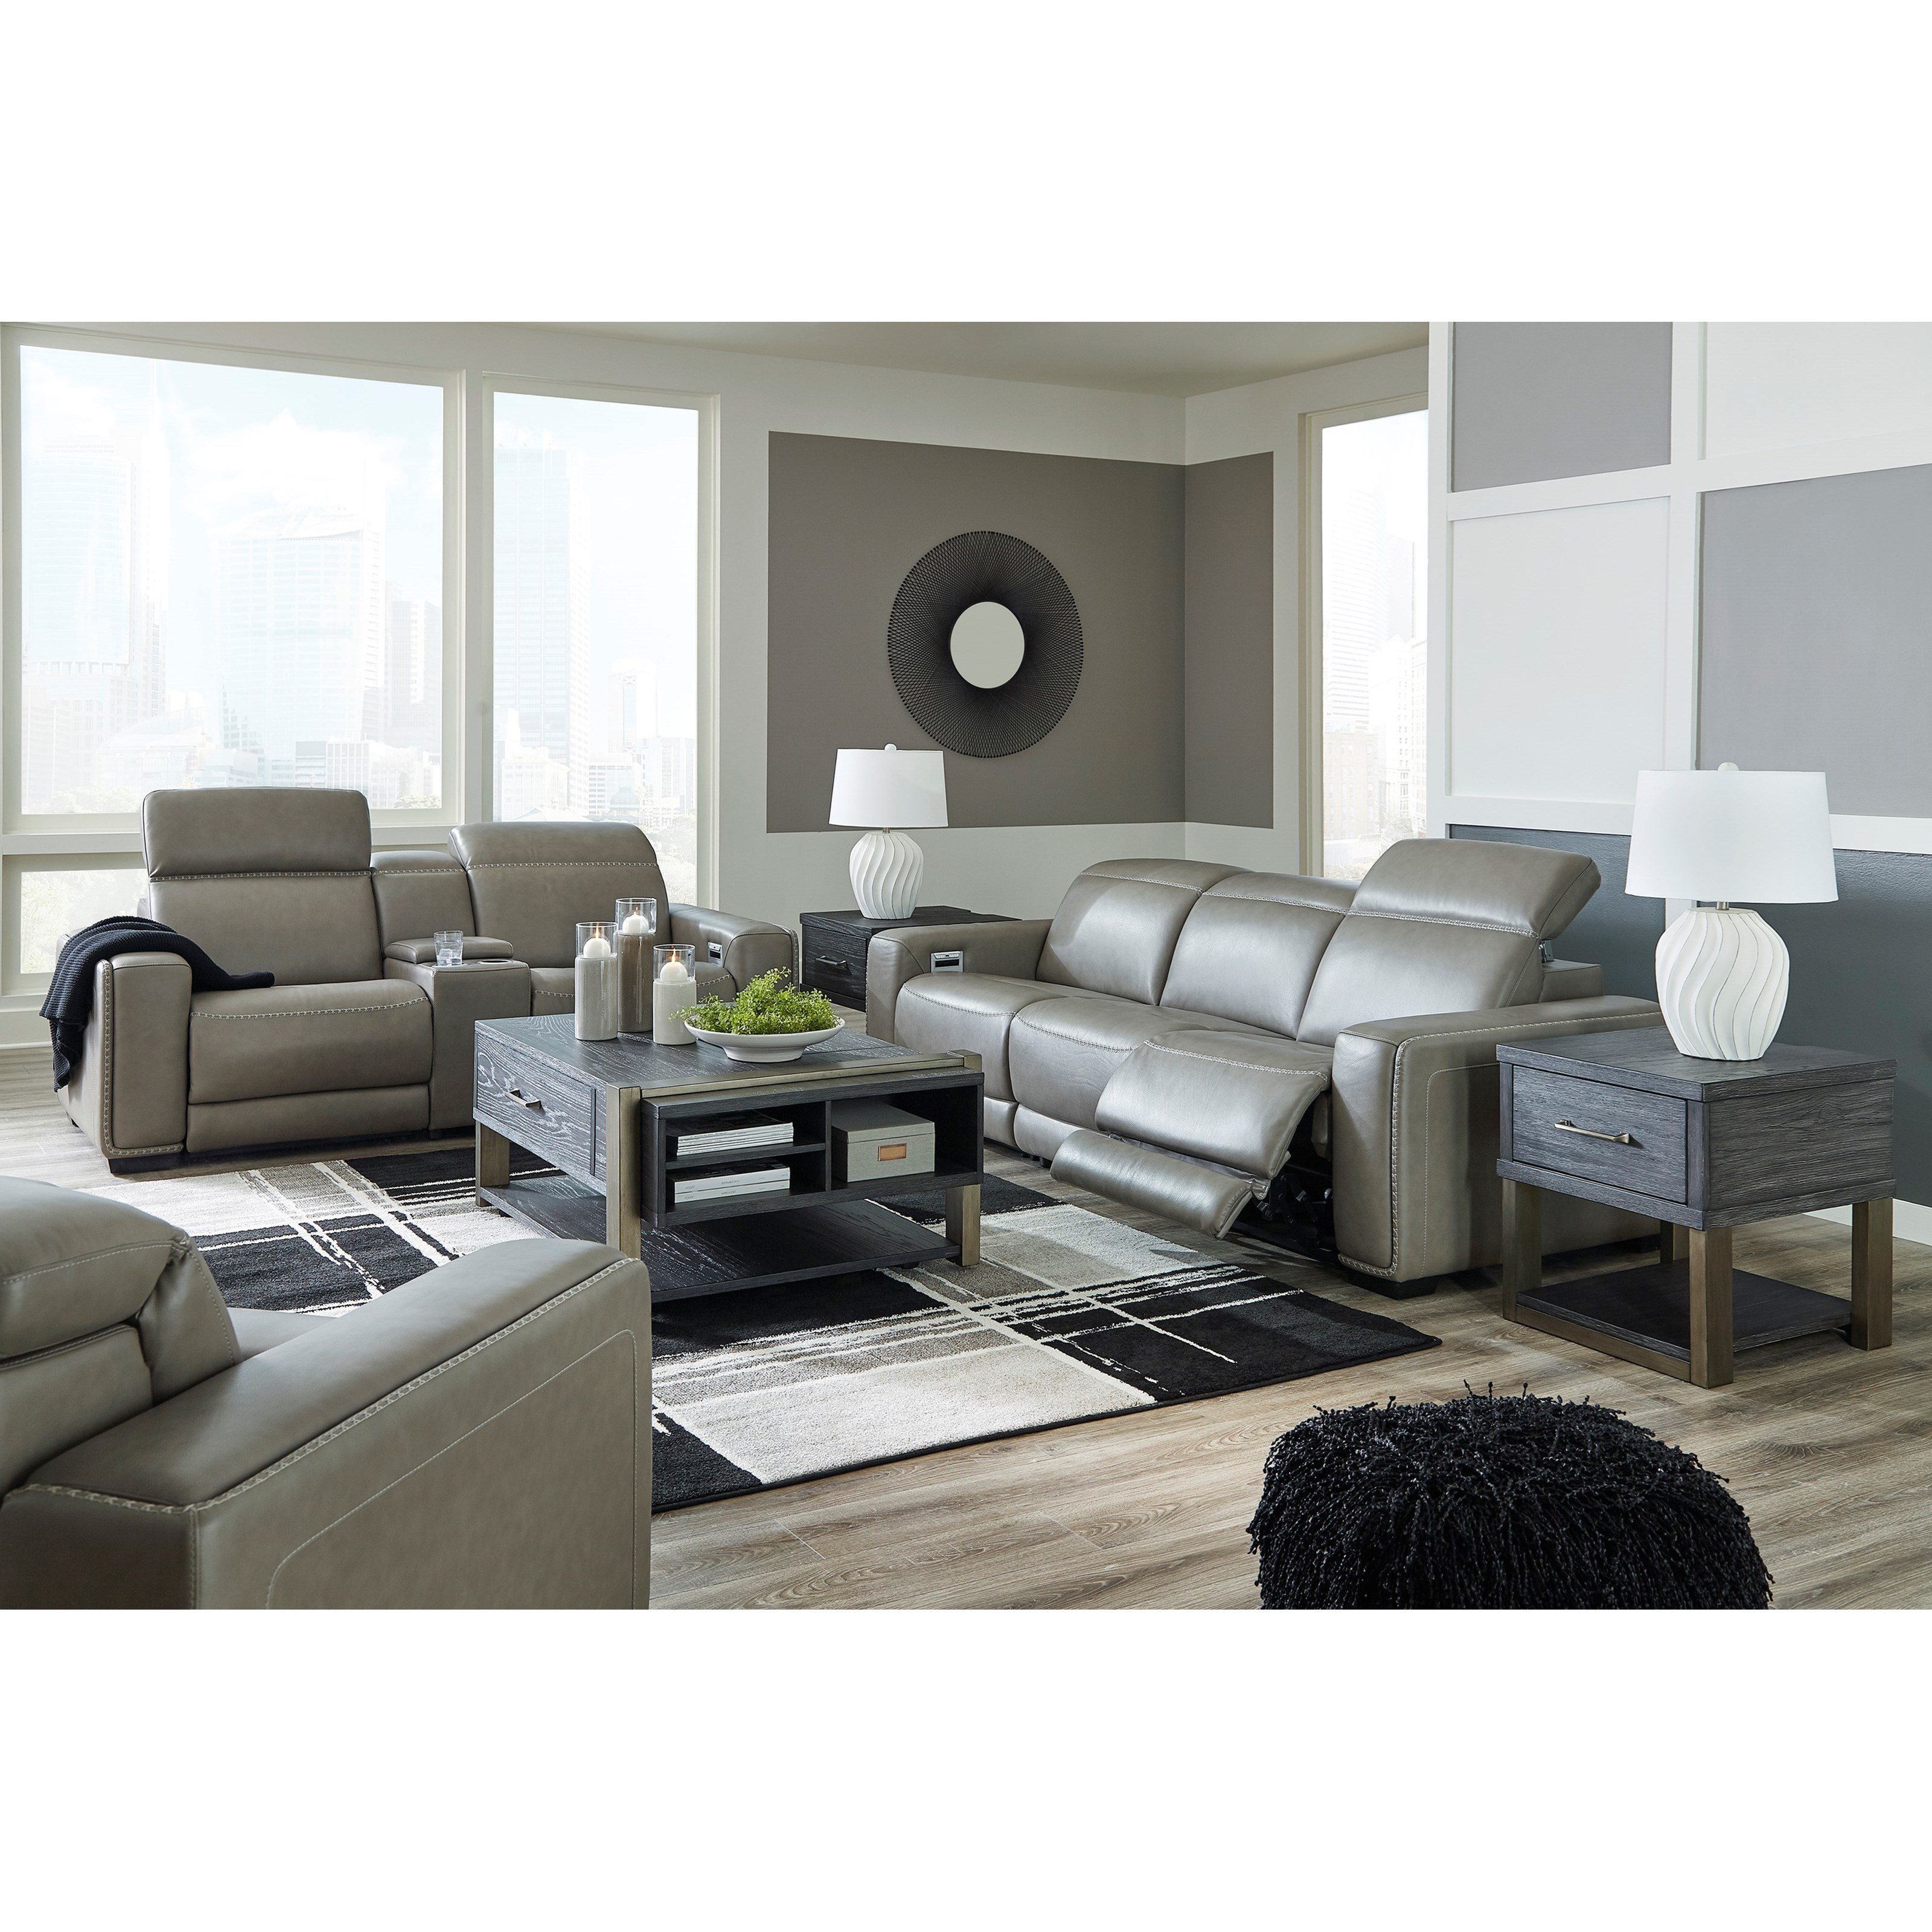 Correze Power Reclining Living Room Group by Ashley (Signature Design) at Johnny Janosik